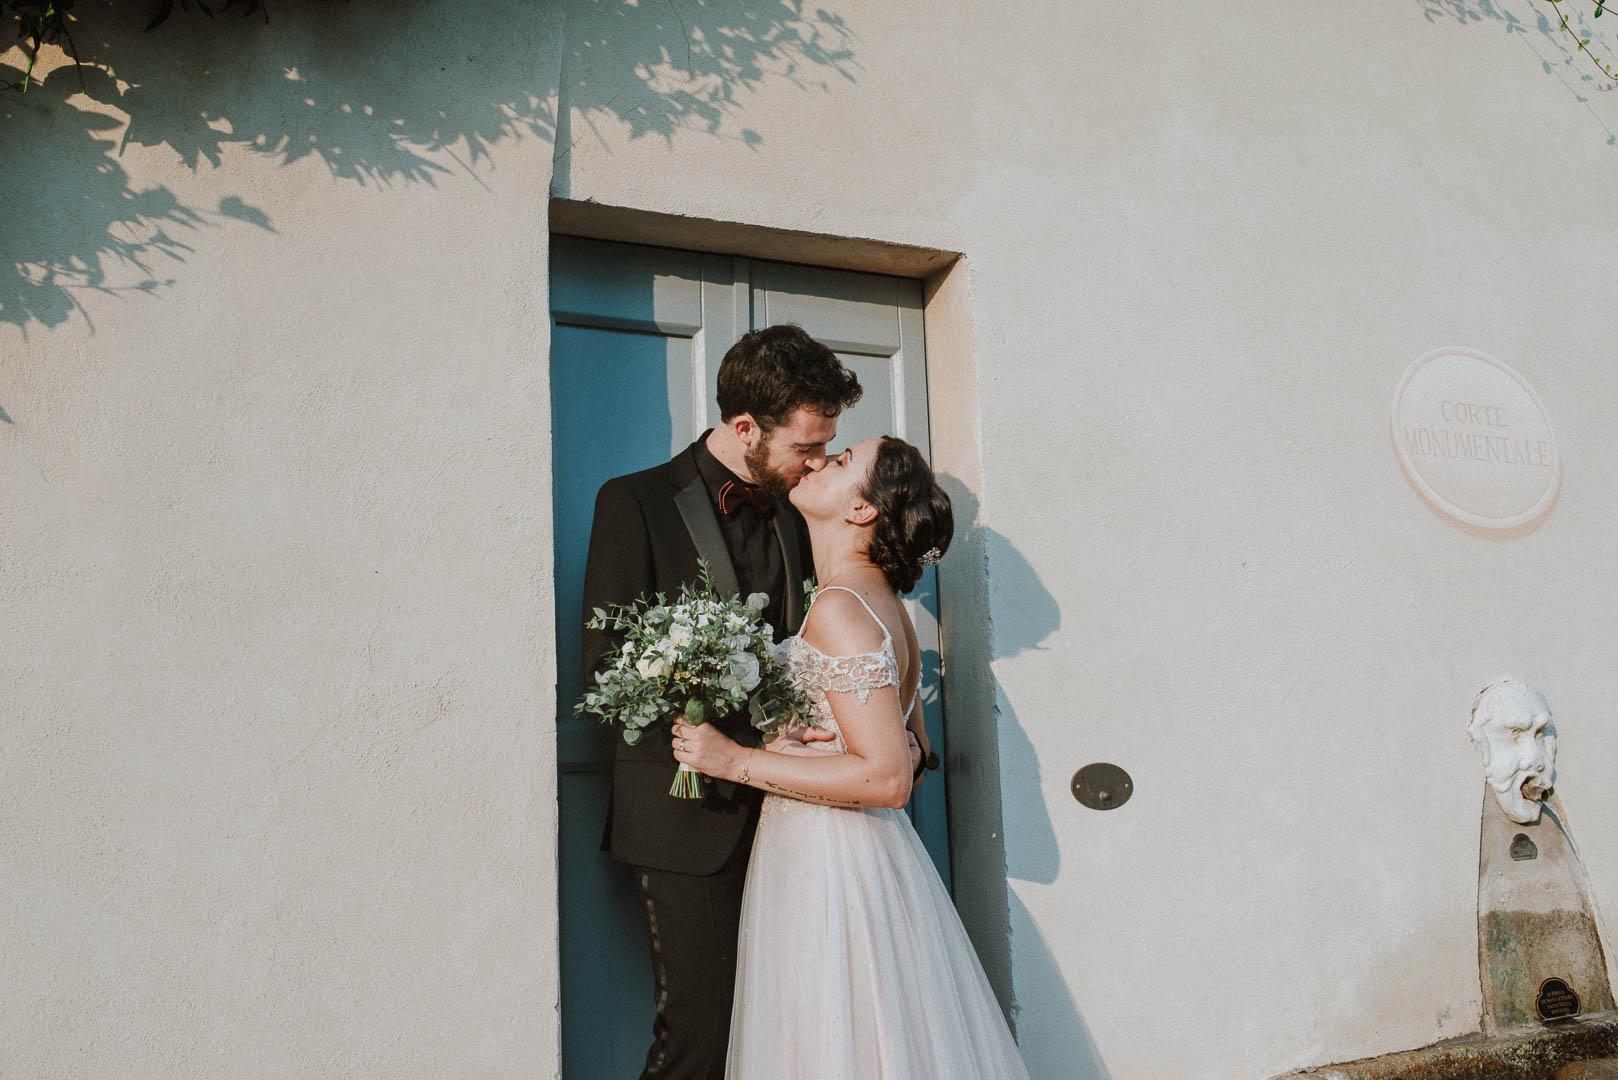 wedding-photographer-destination-fineart-bespoke-reportage-tuscany-villascorzi-vivianeizzo-spazio46-107